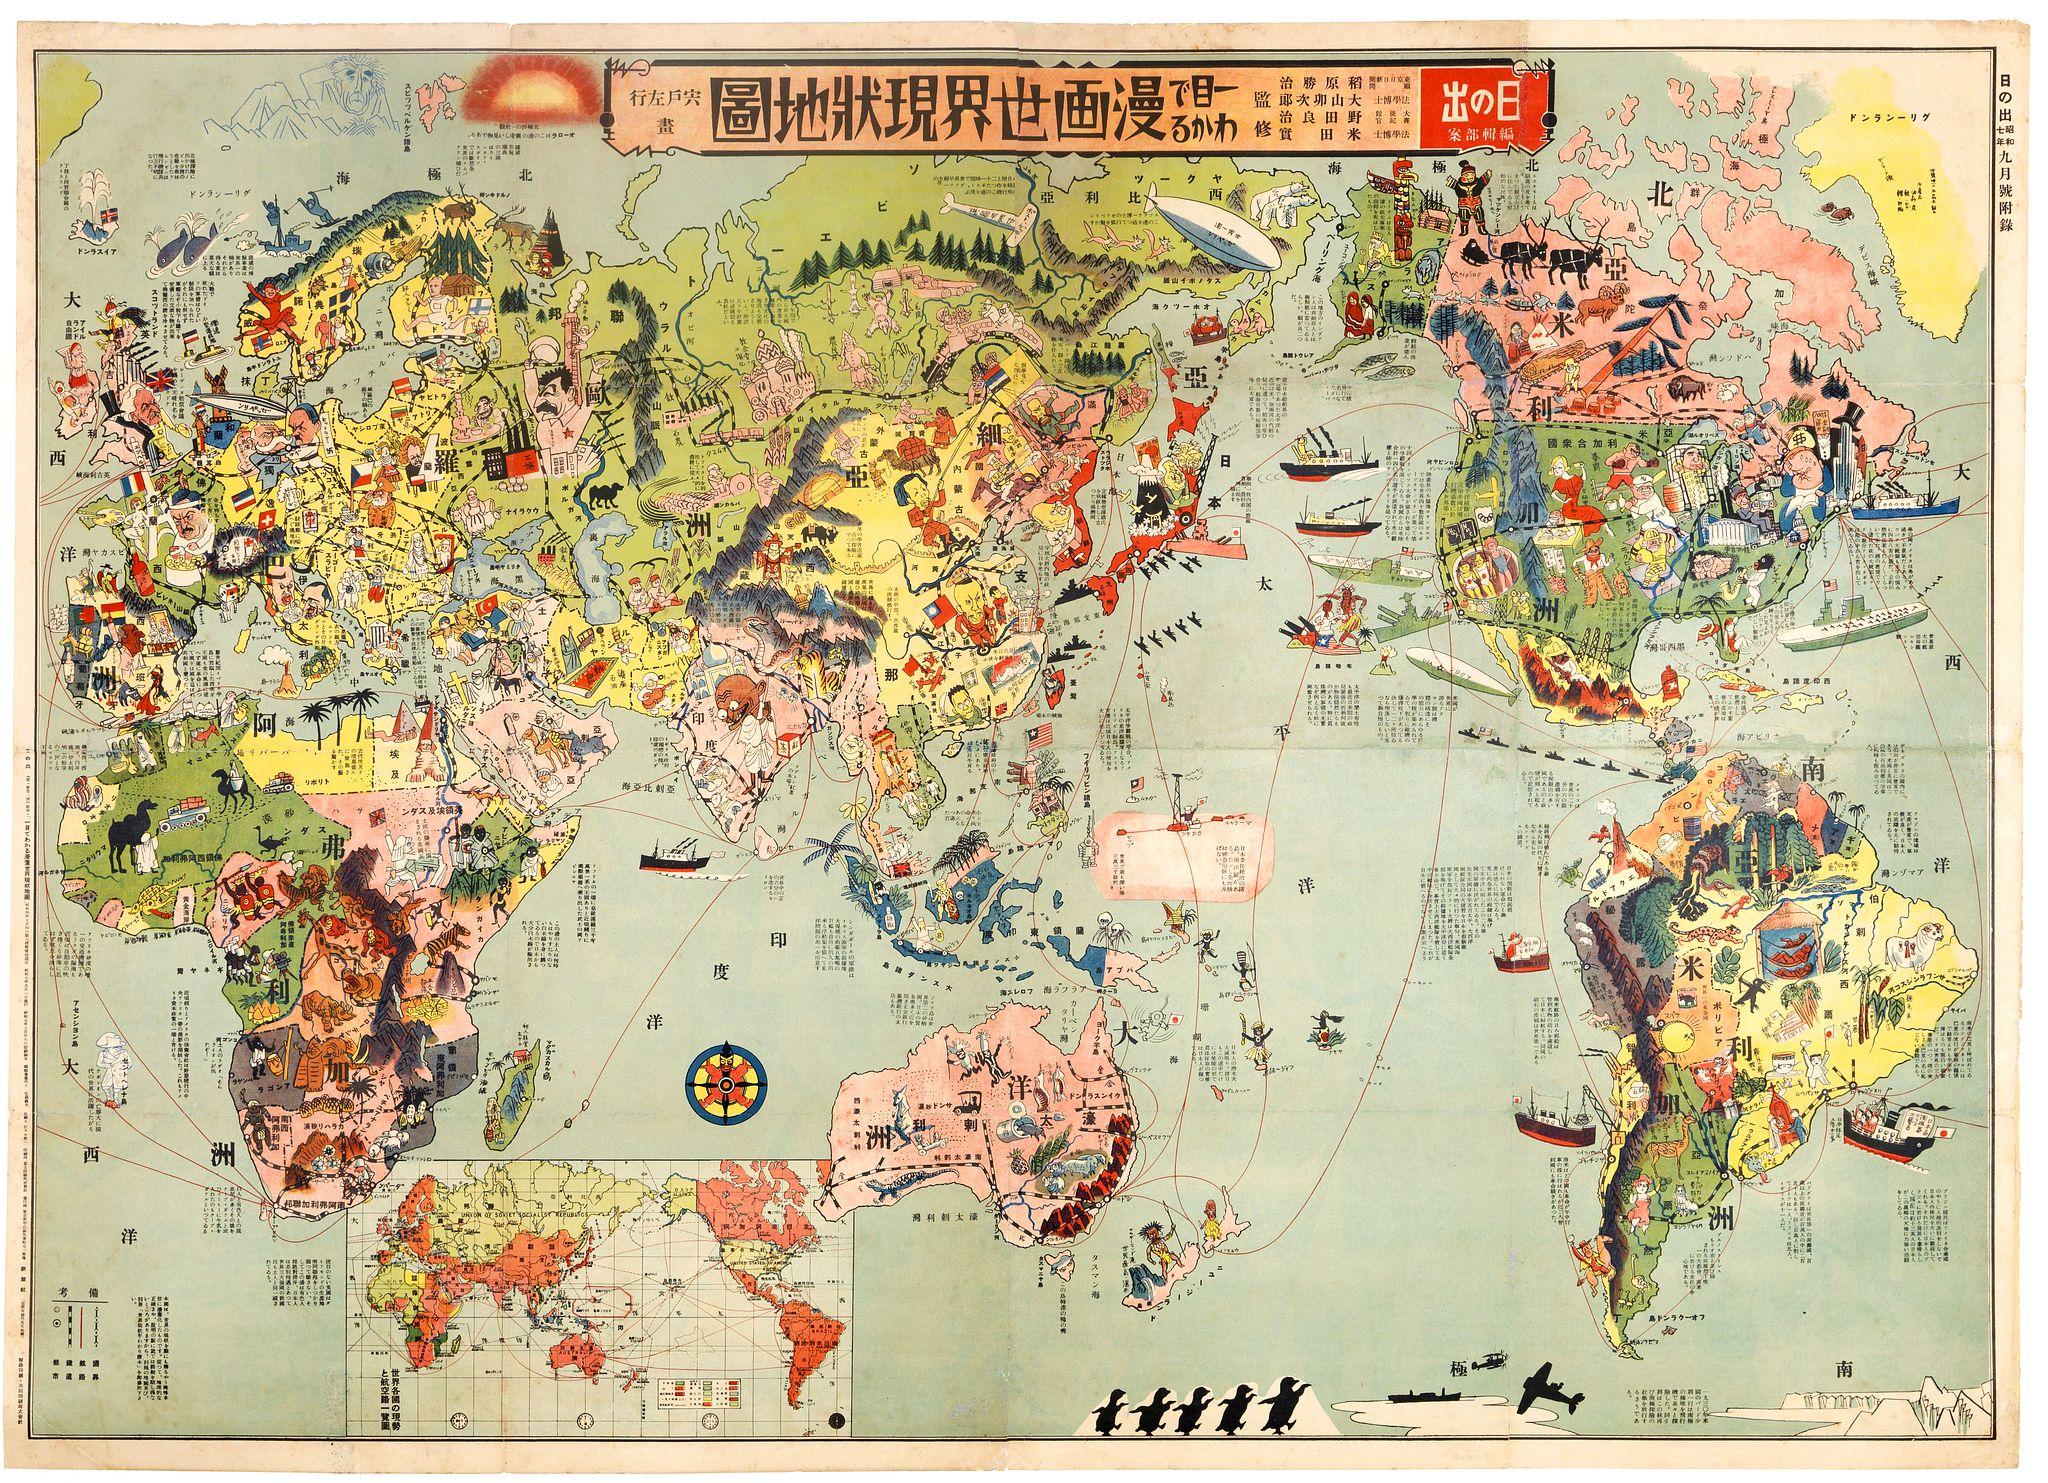 SHISHIDO SAGYO - Hitome de wakaru Manga sekai genjō chizu. At a  glance: Cartoon Map of the Current World Situation. 一目でわかる 漫画世界現状地圖